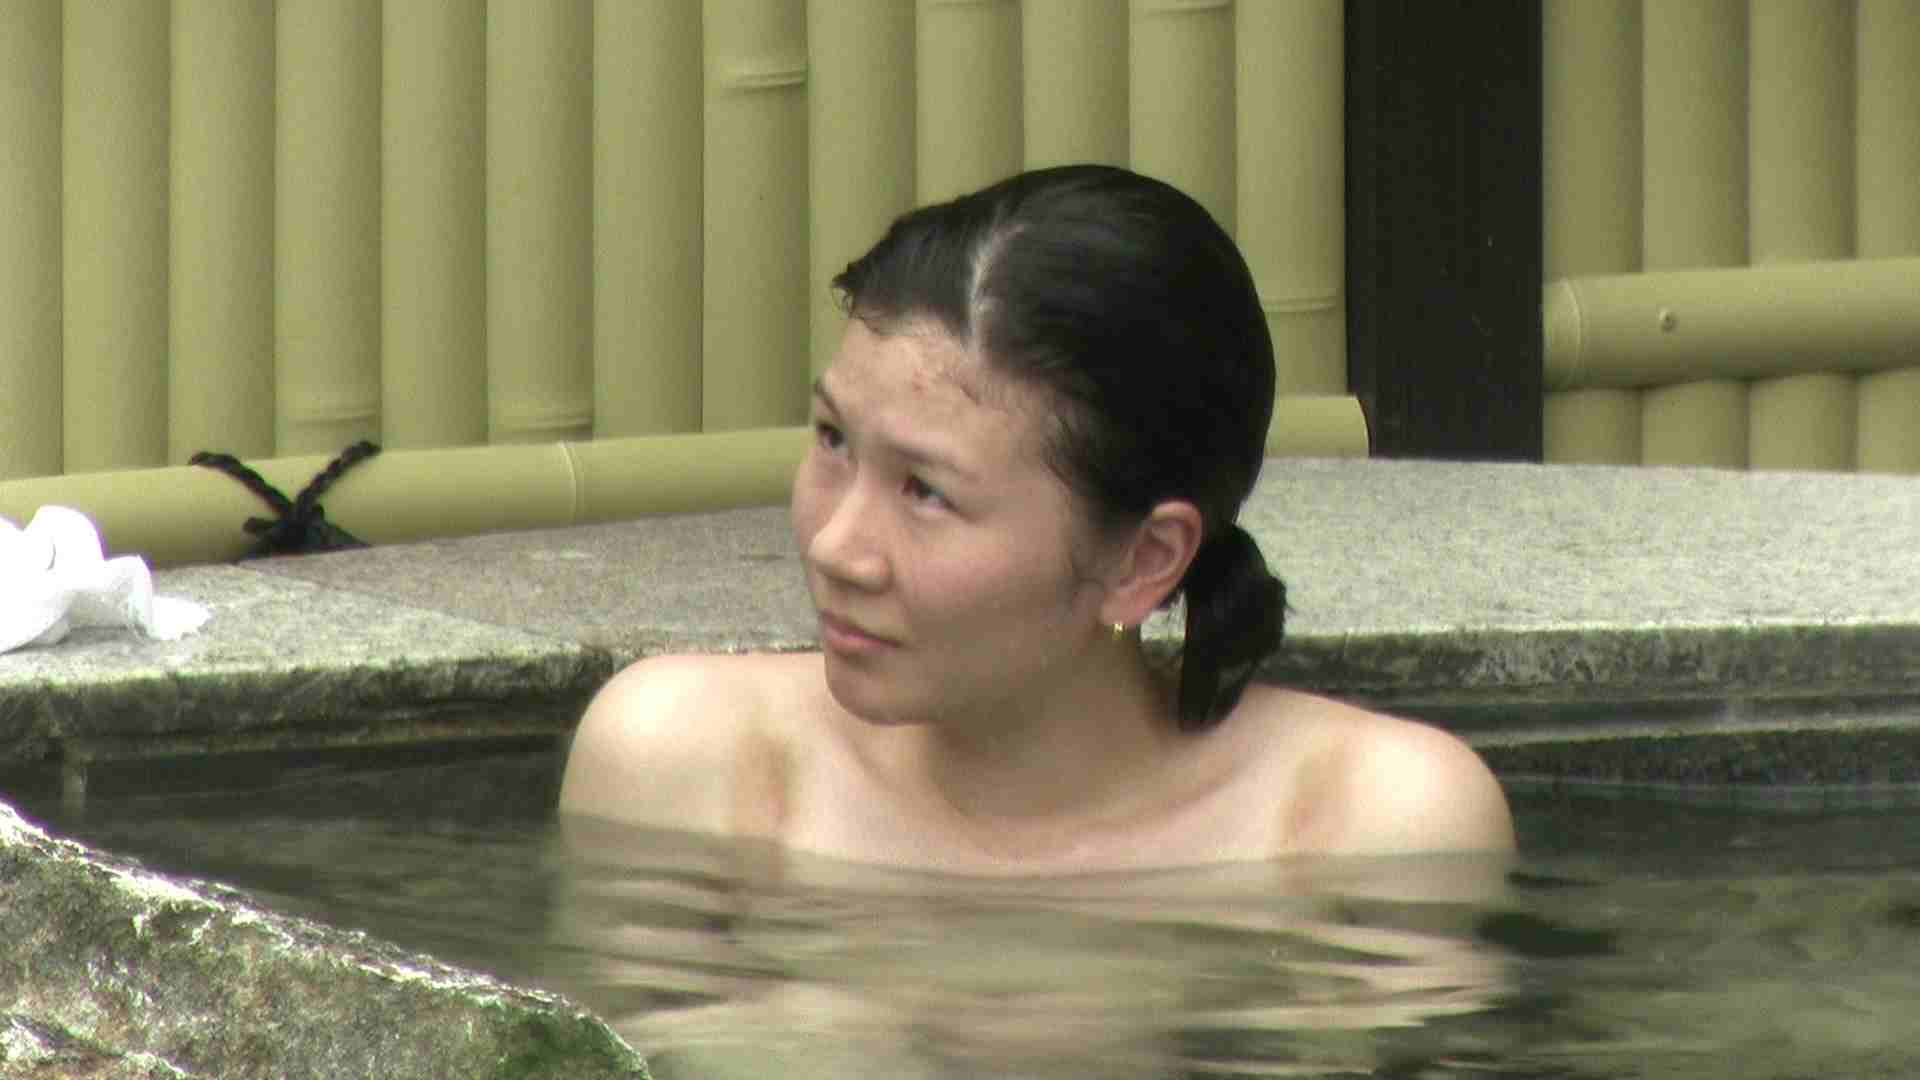 Aquaな露天風呂Vol.187 盗撮映像  99Pix 36